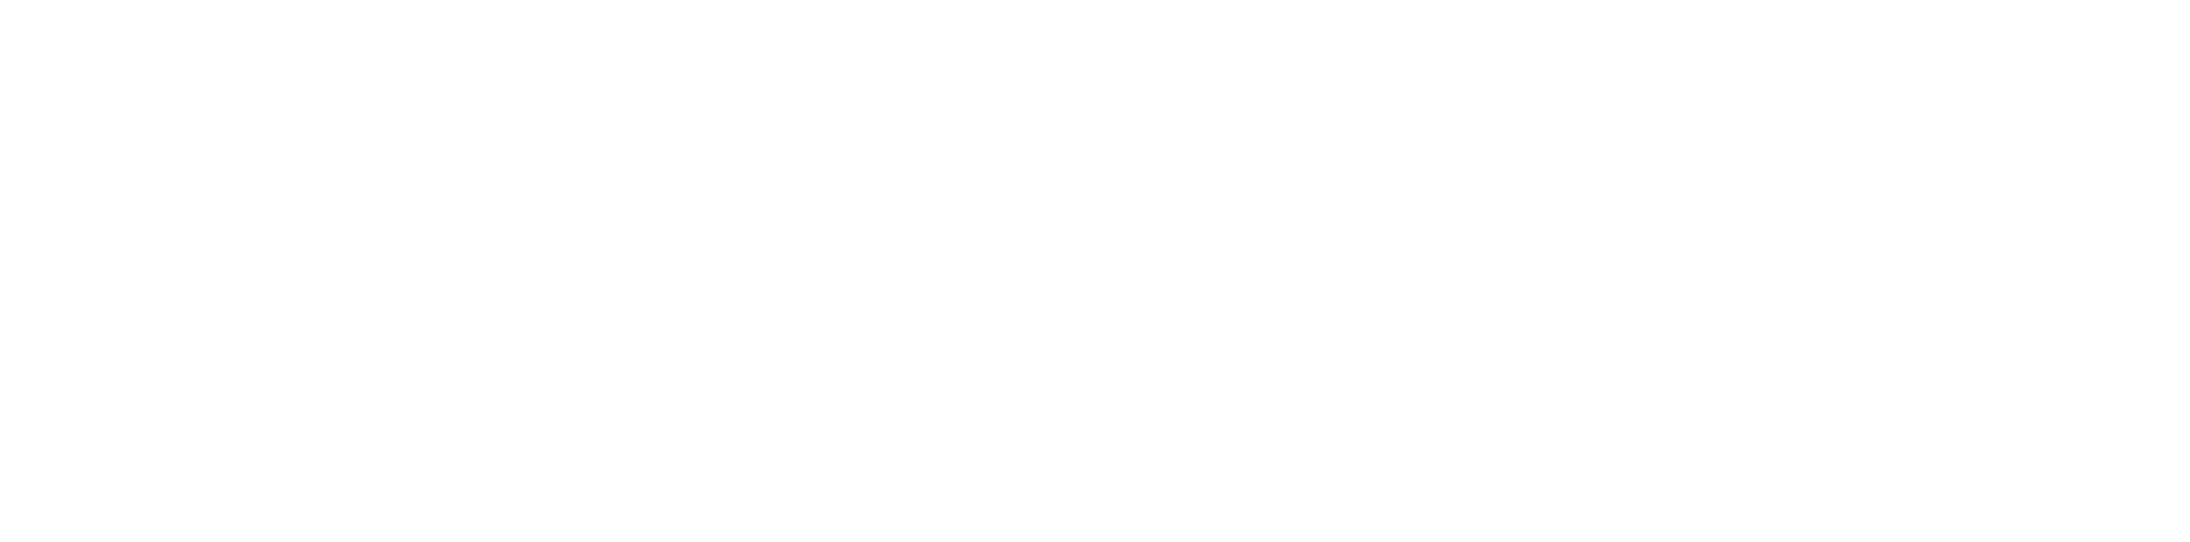 Case Western Reserve University - home